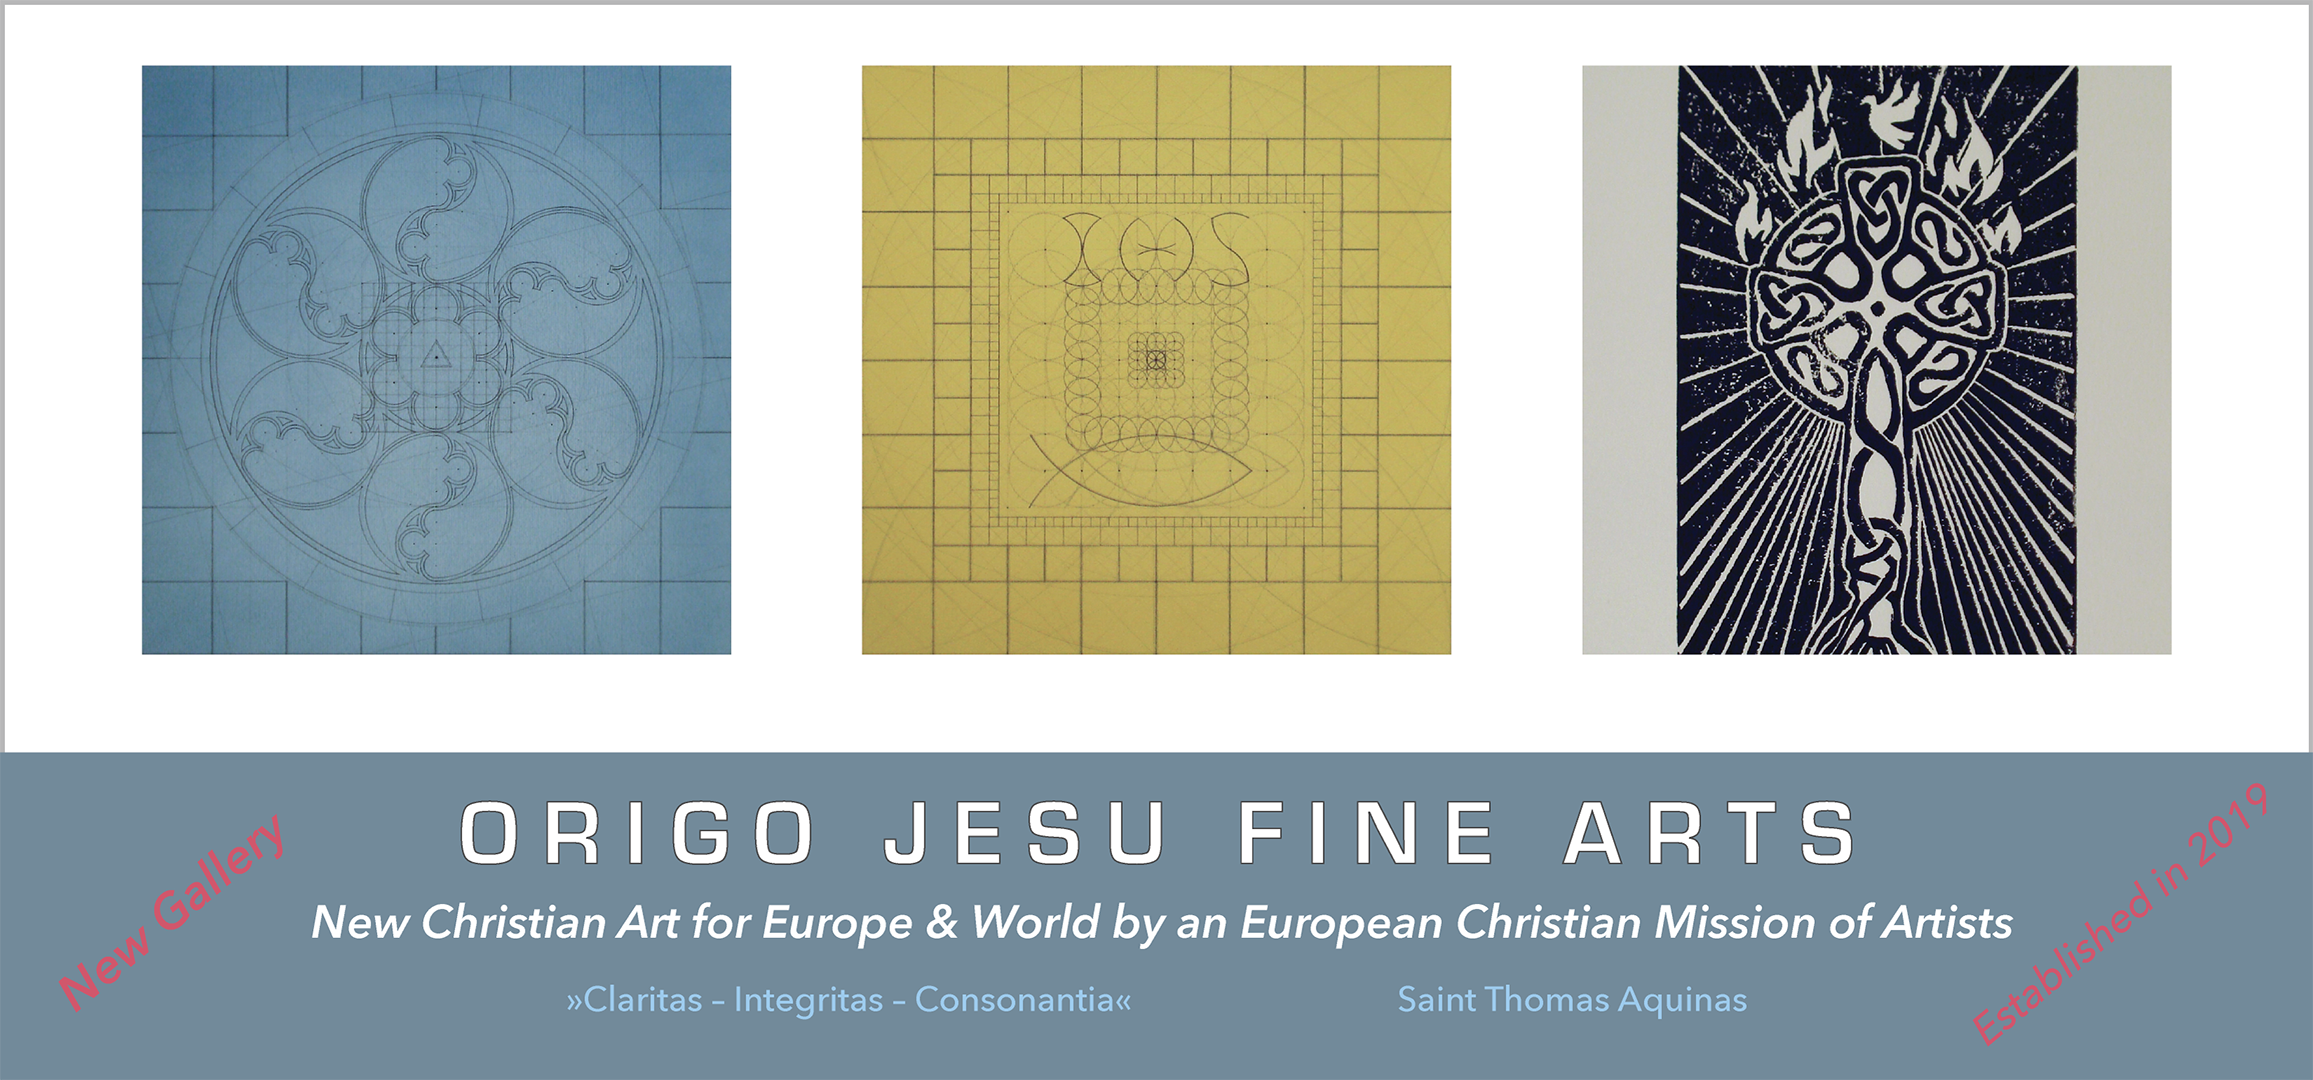 origo-jesu-invitation-card-a4_2019.04.22_usa.front_2313.png